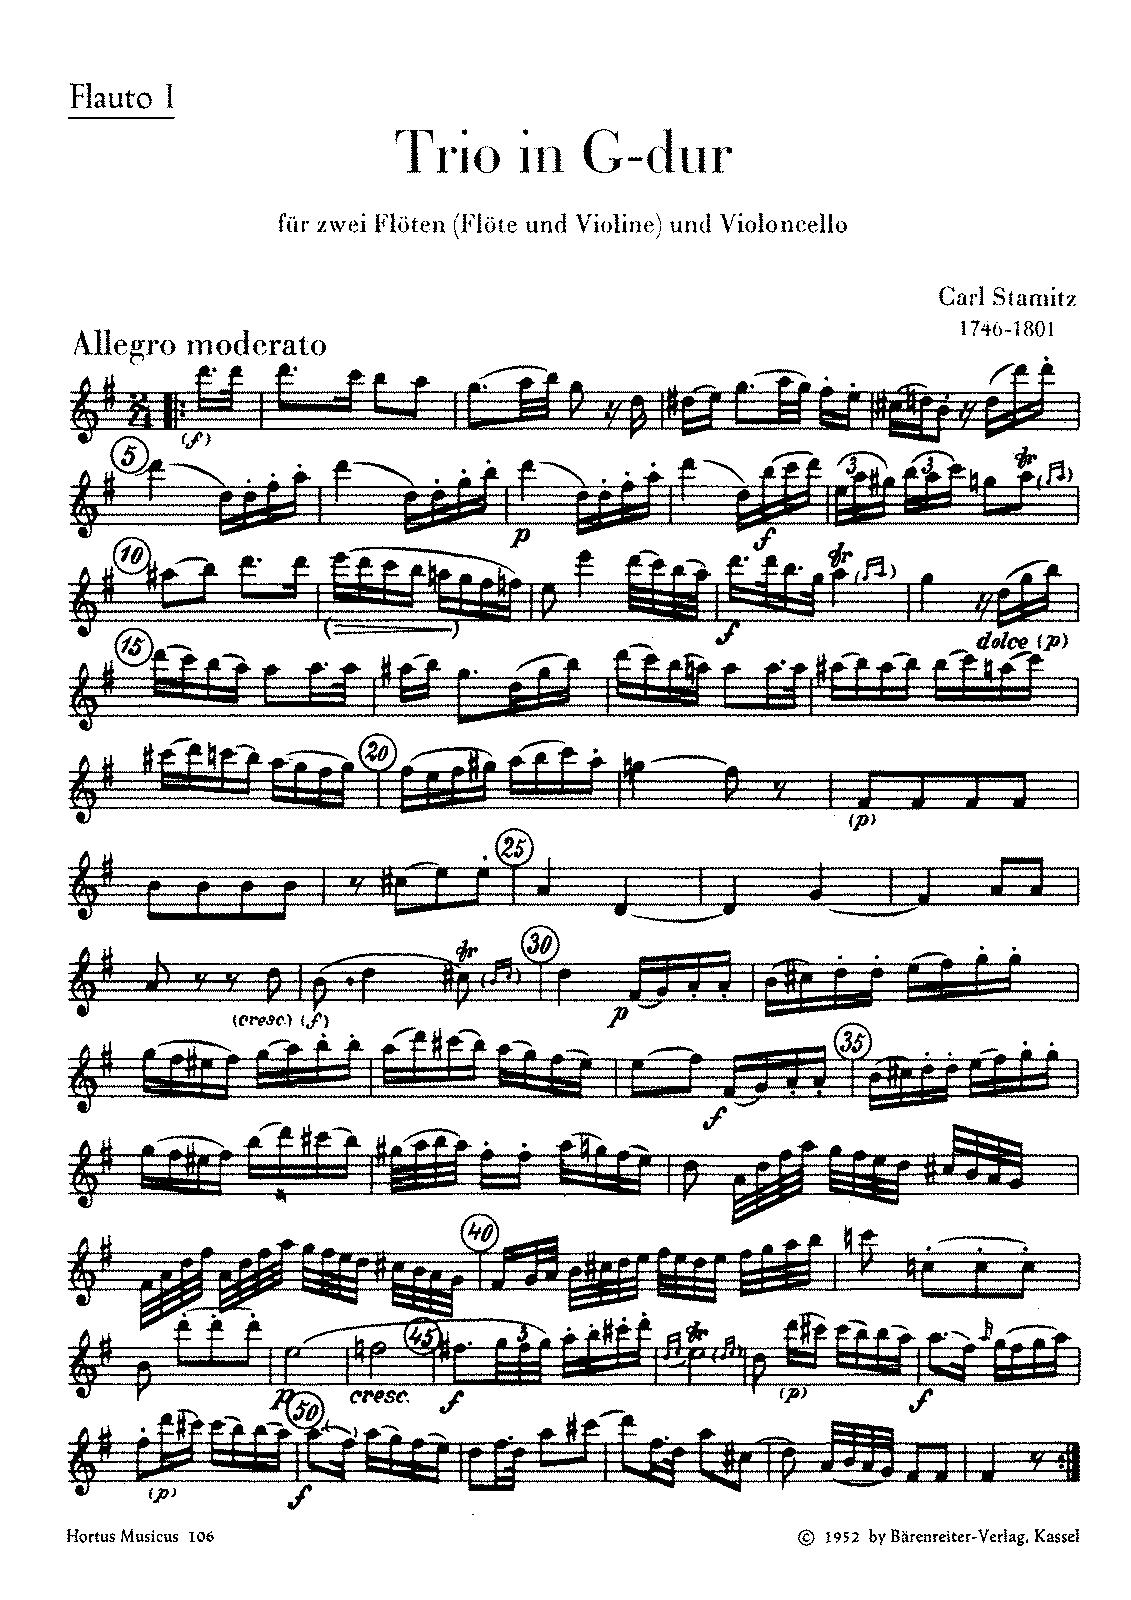 Trio in G major for 2 Flutes and Cello (Stamitz, Carl Philipp